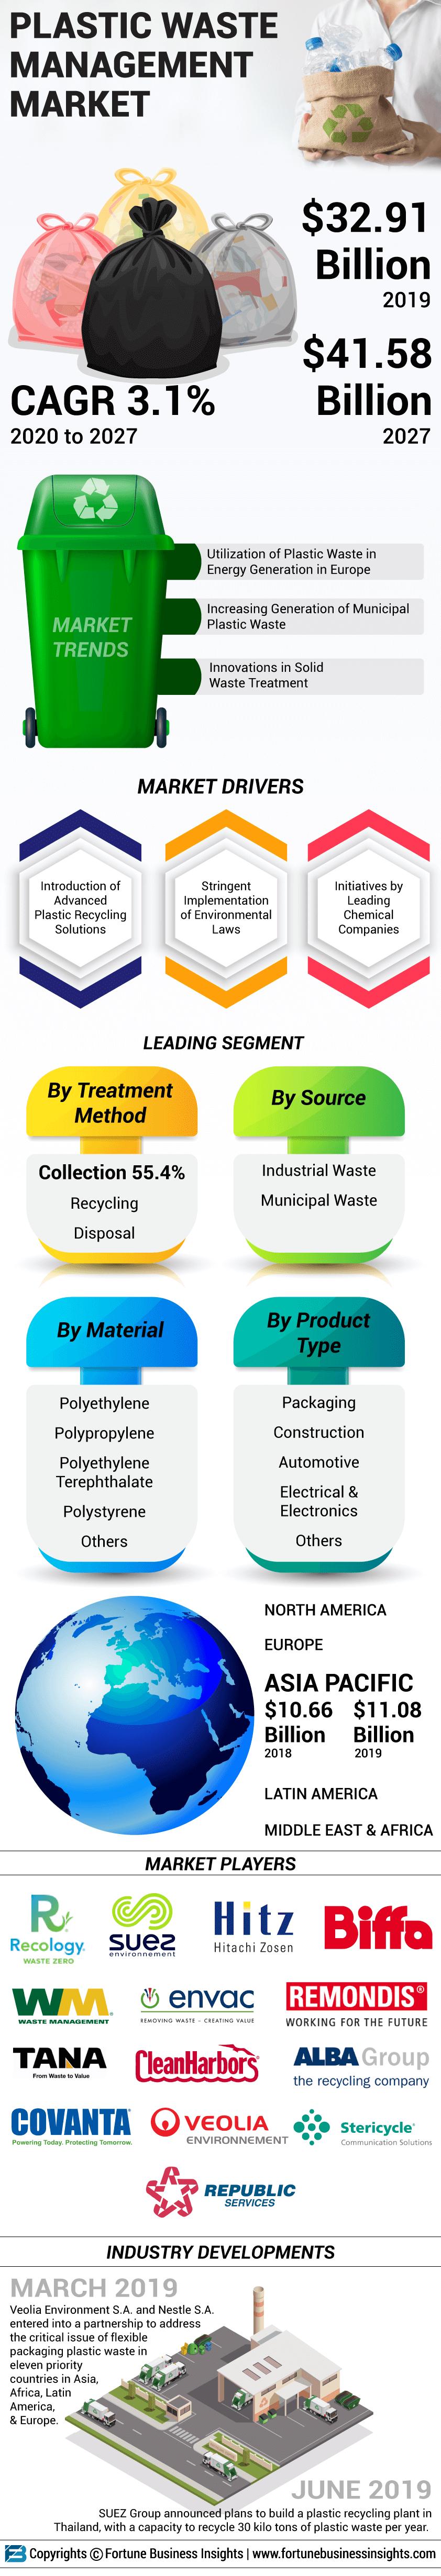 Plastic Waste Management Market